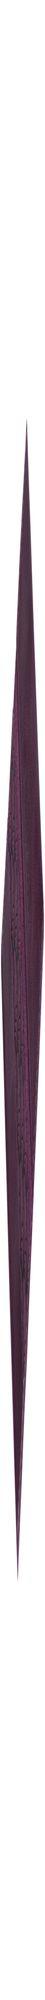 Футляр для визиток Letizia, фиолетовый